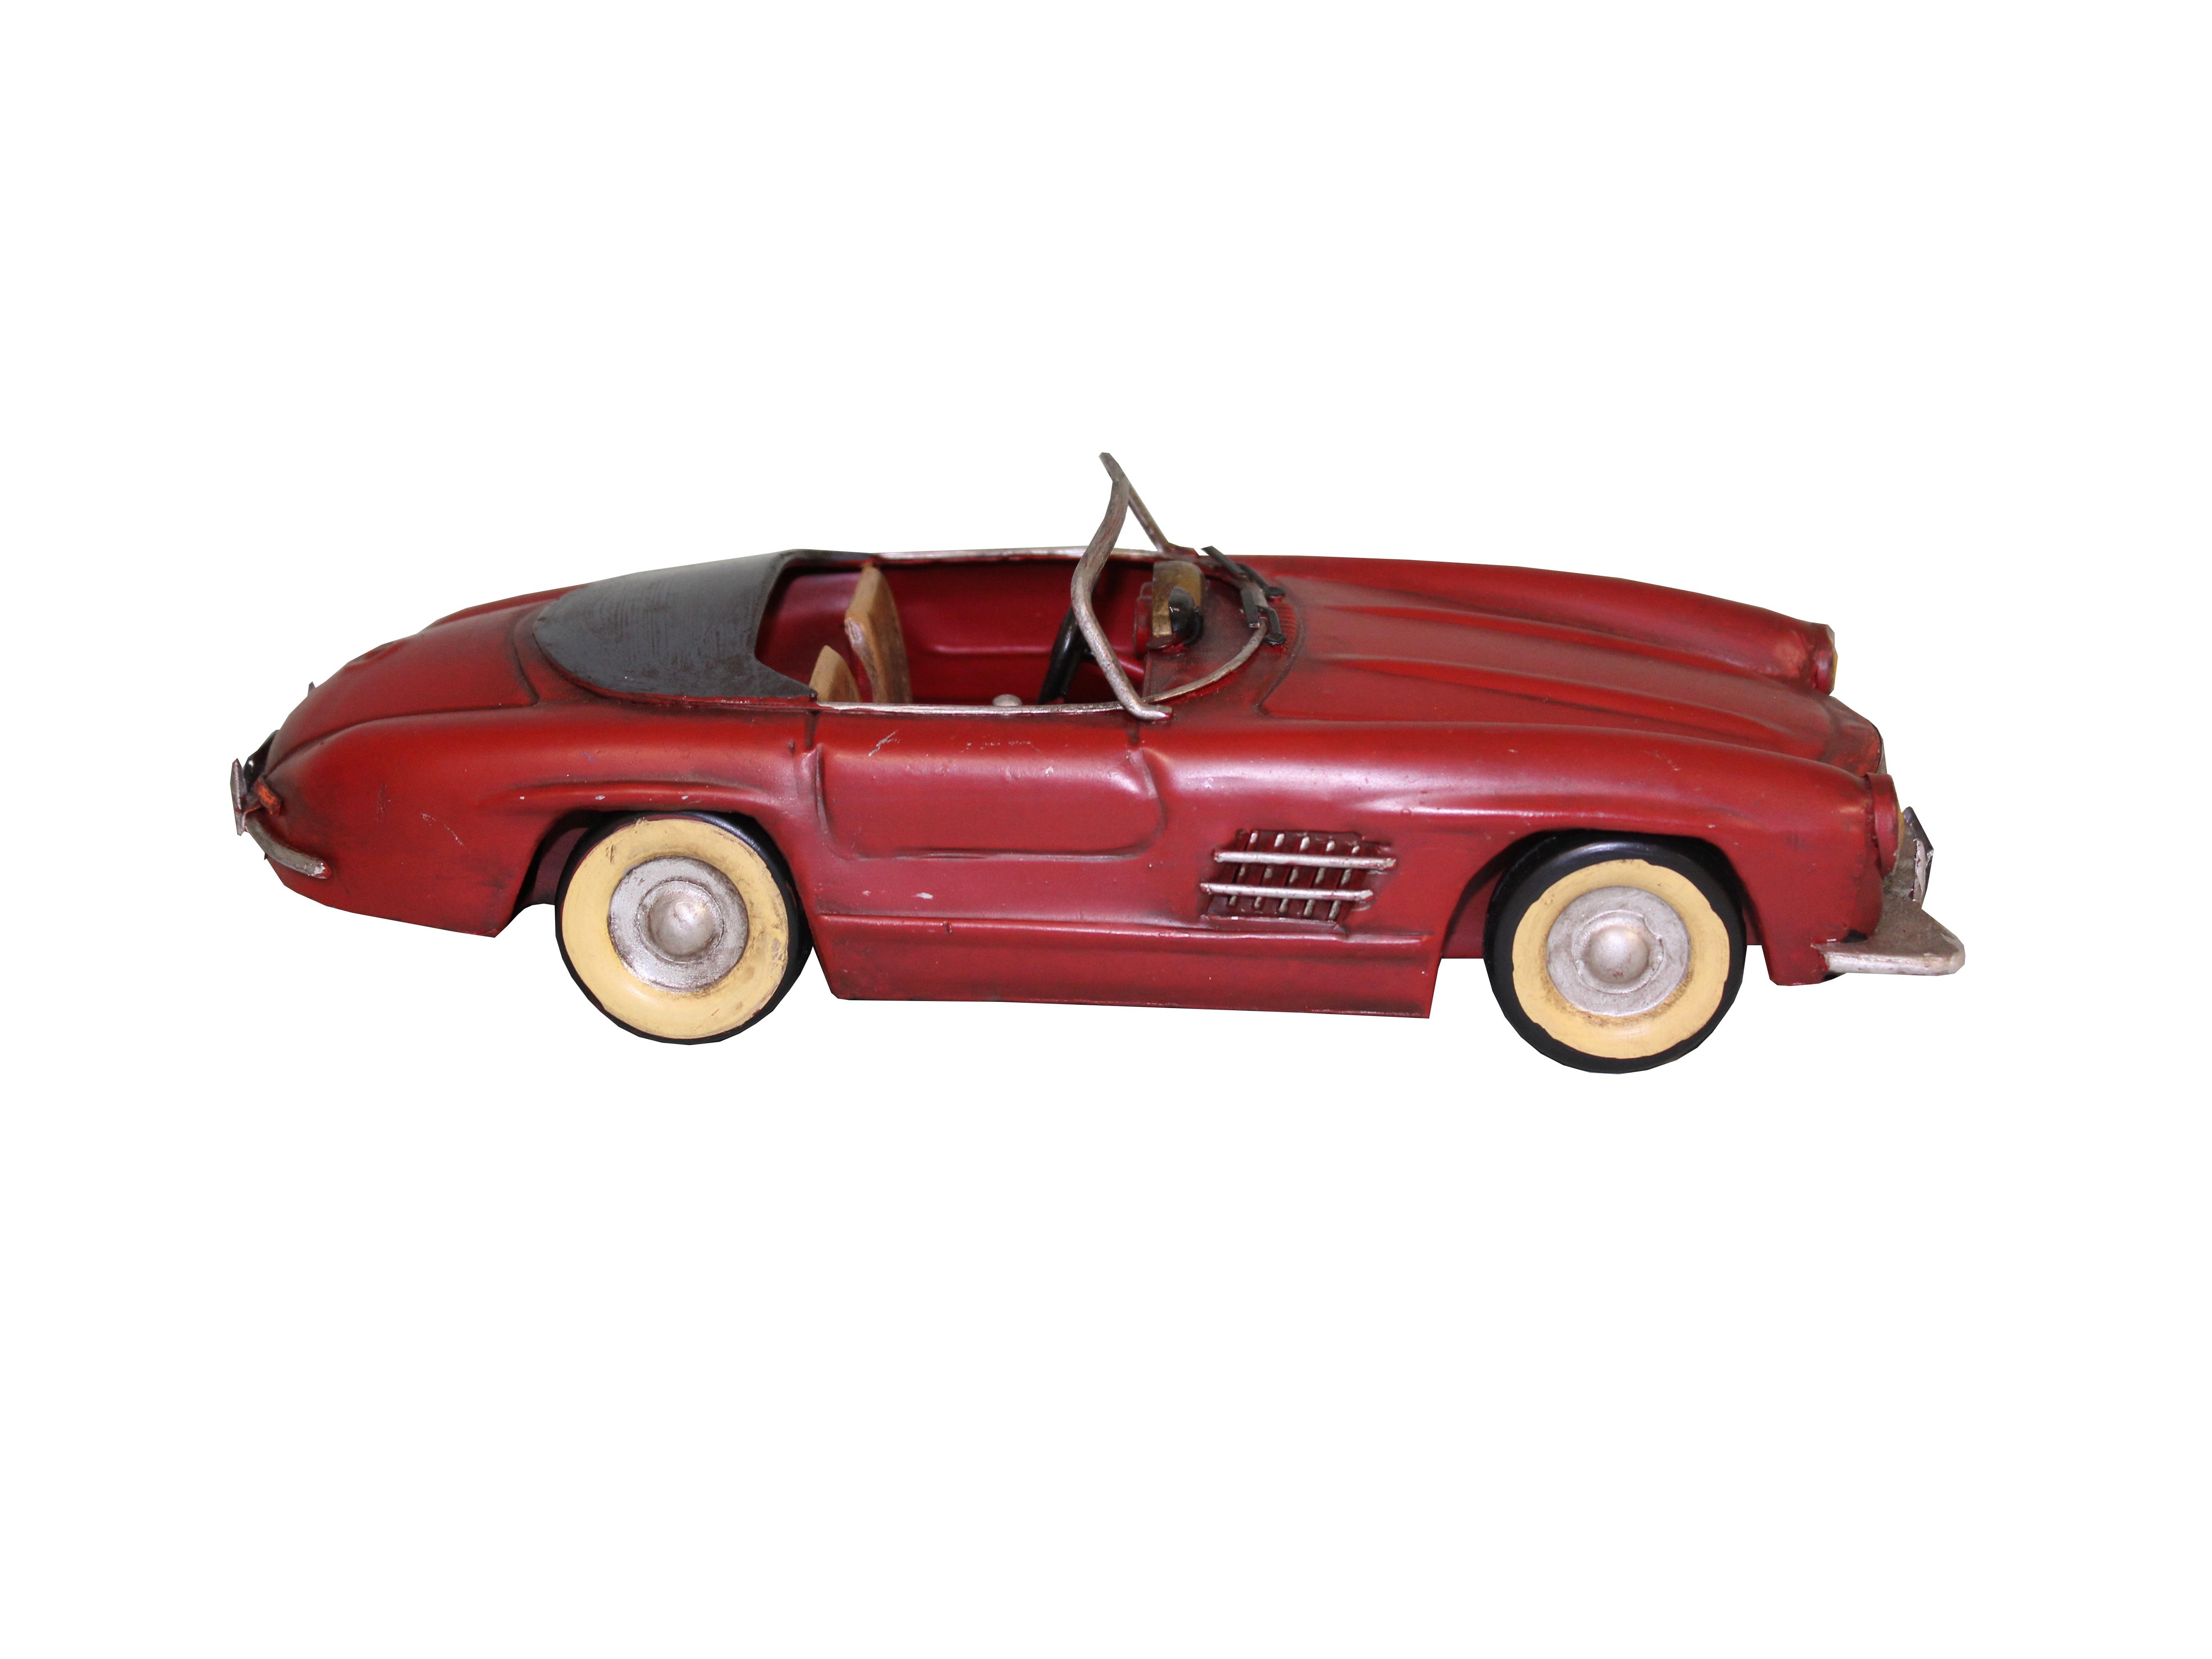 Декоративный автомобиль MercedesДругое<br><br><br>Material: Железо<br>Length см: None<br>Width см: 28.6<br>Depth см: 11.55<br>Height см: 7.7